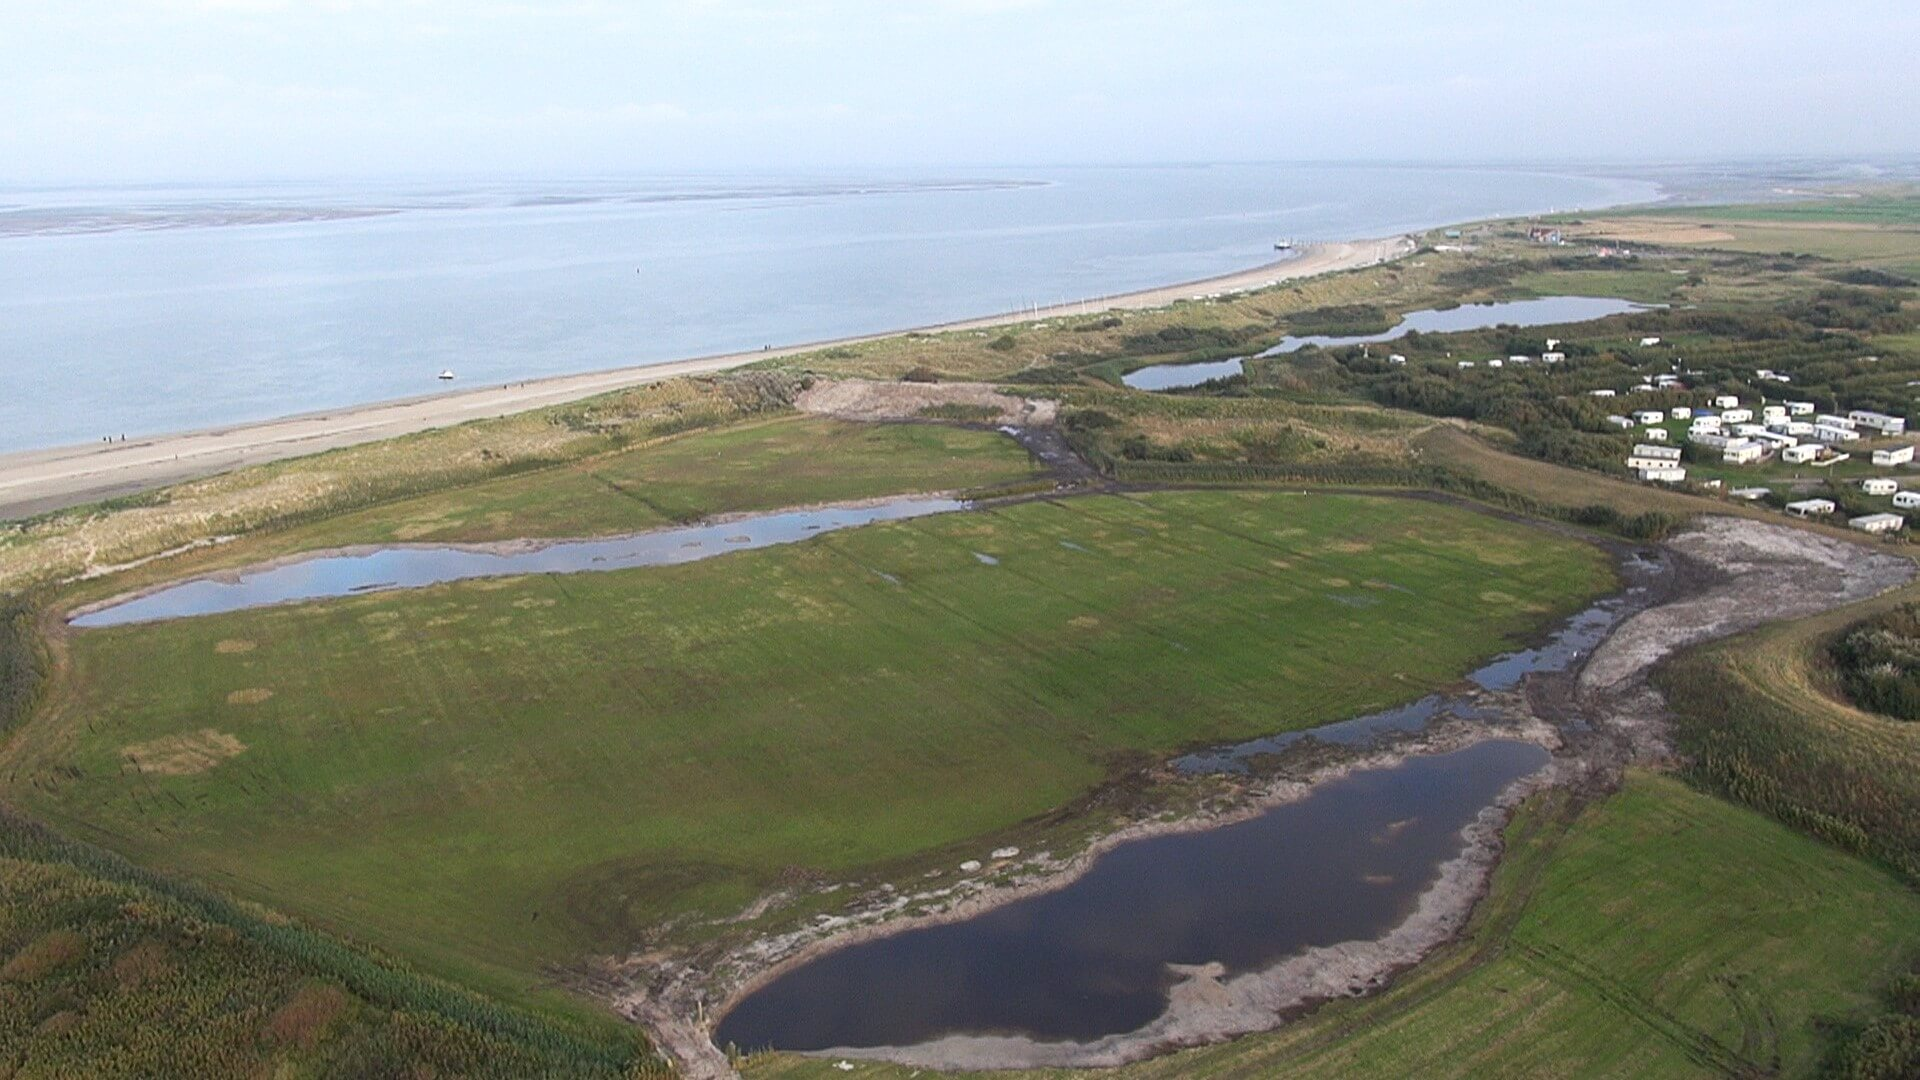 luchtfoto renvogelveld 001 Large